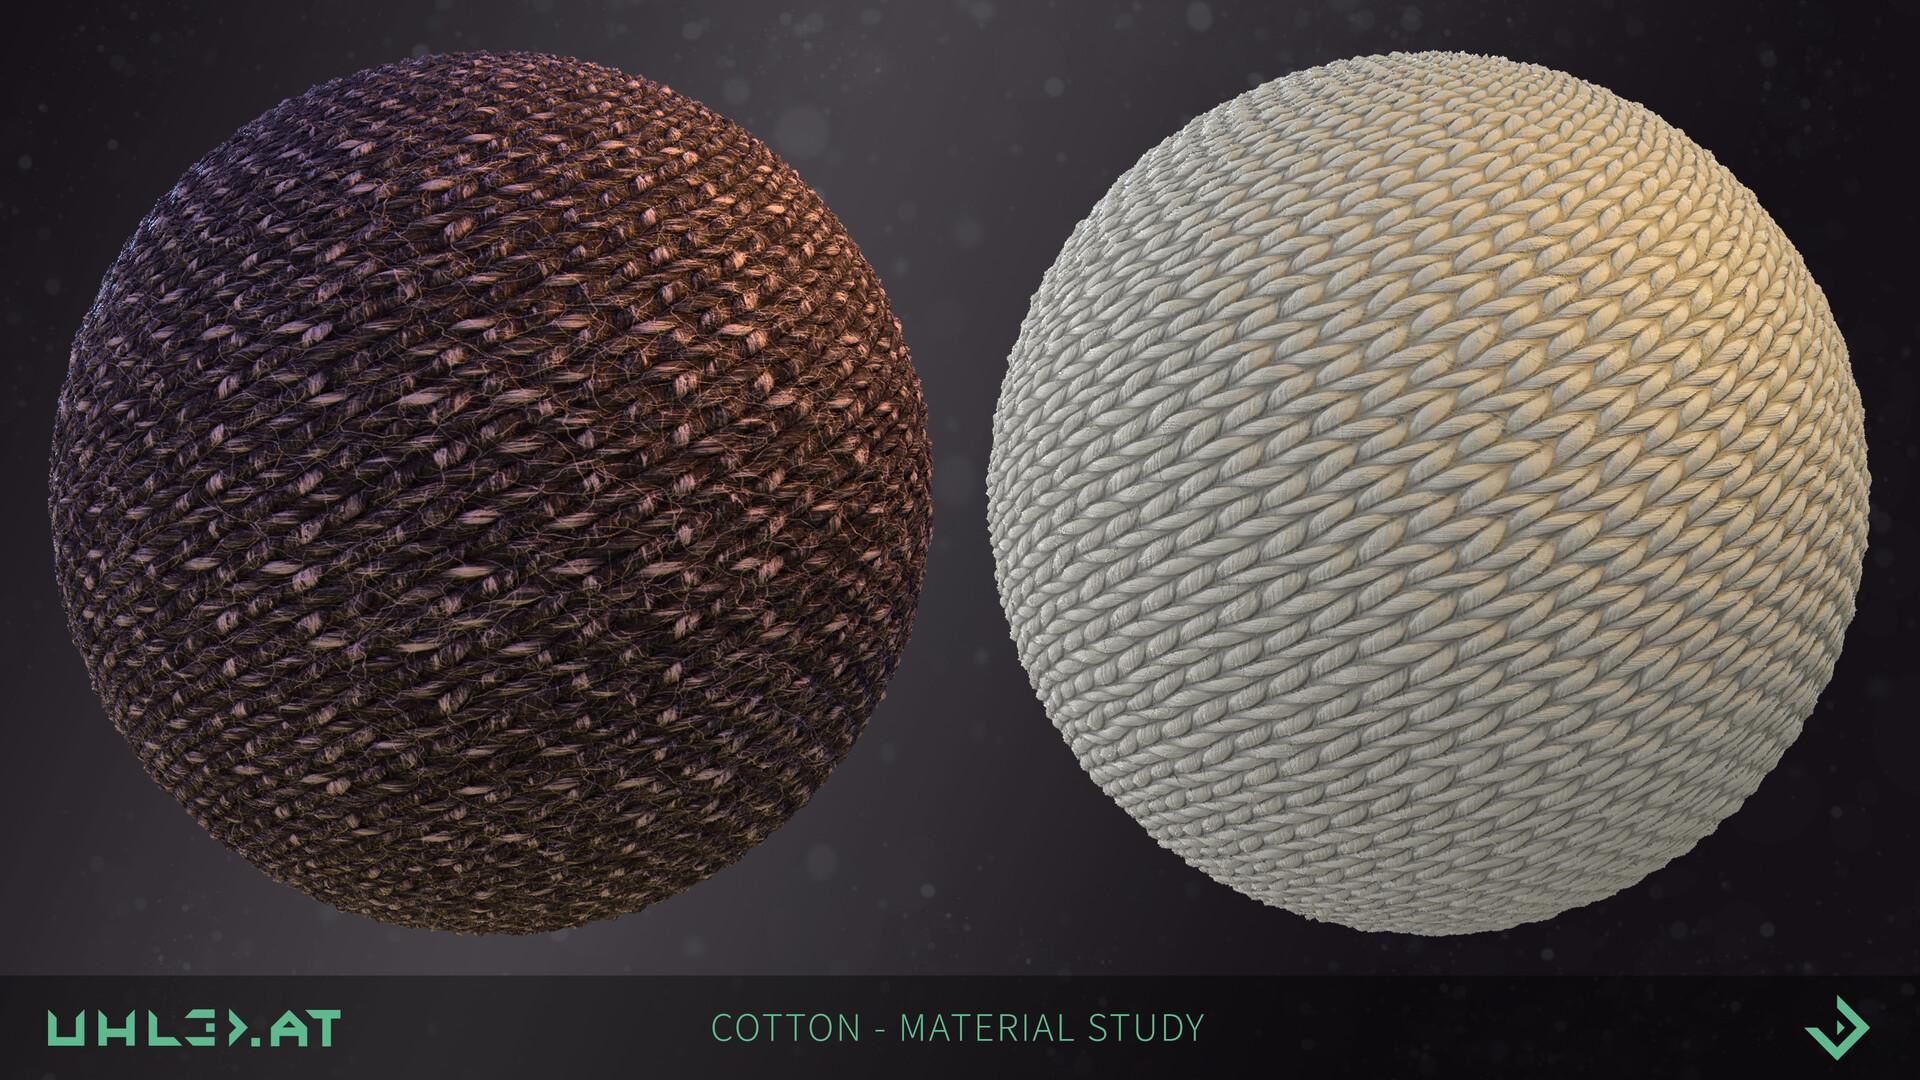 Dominik uhl cotton study 01